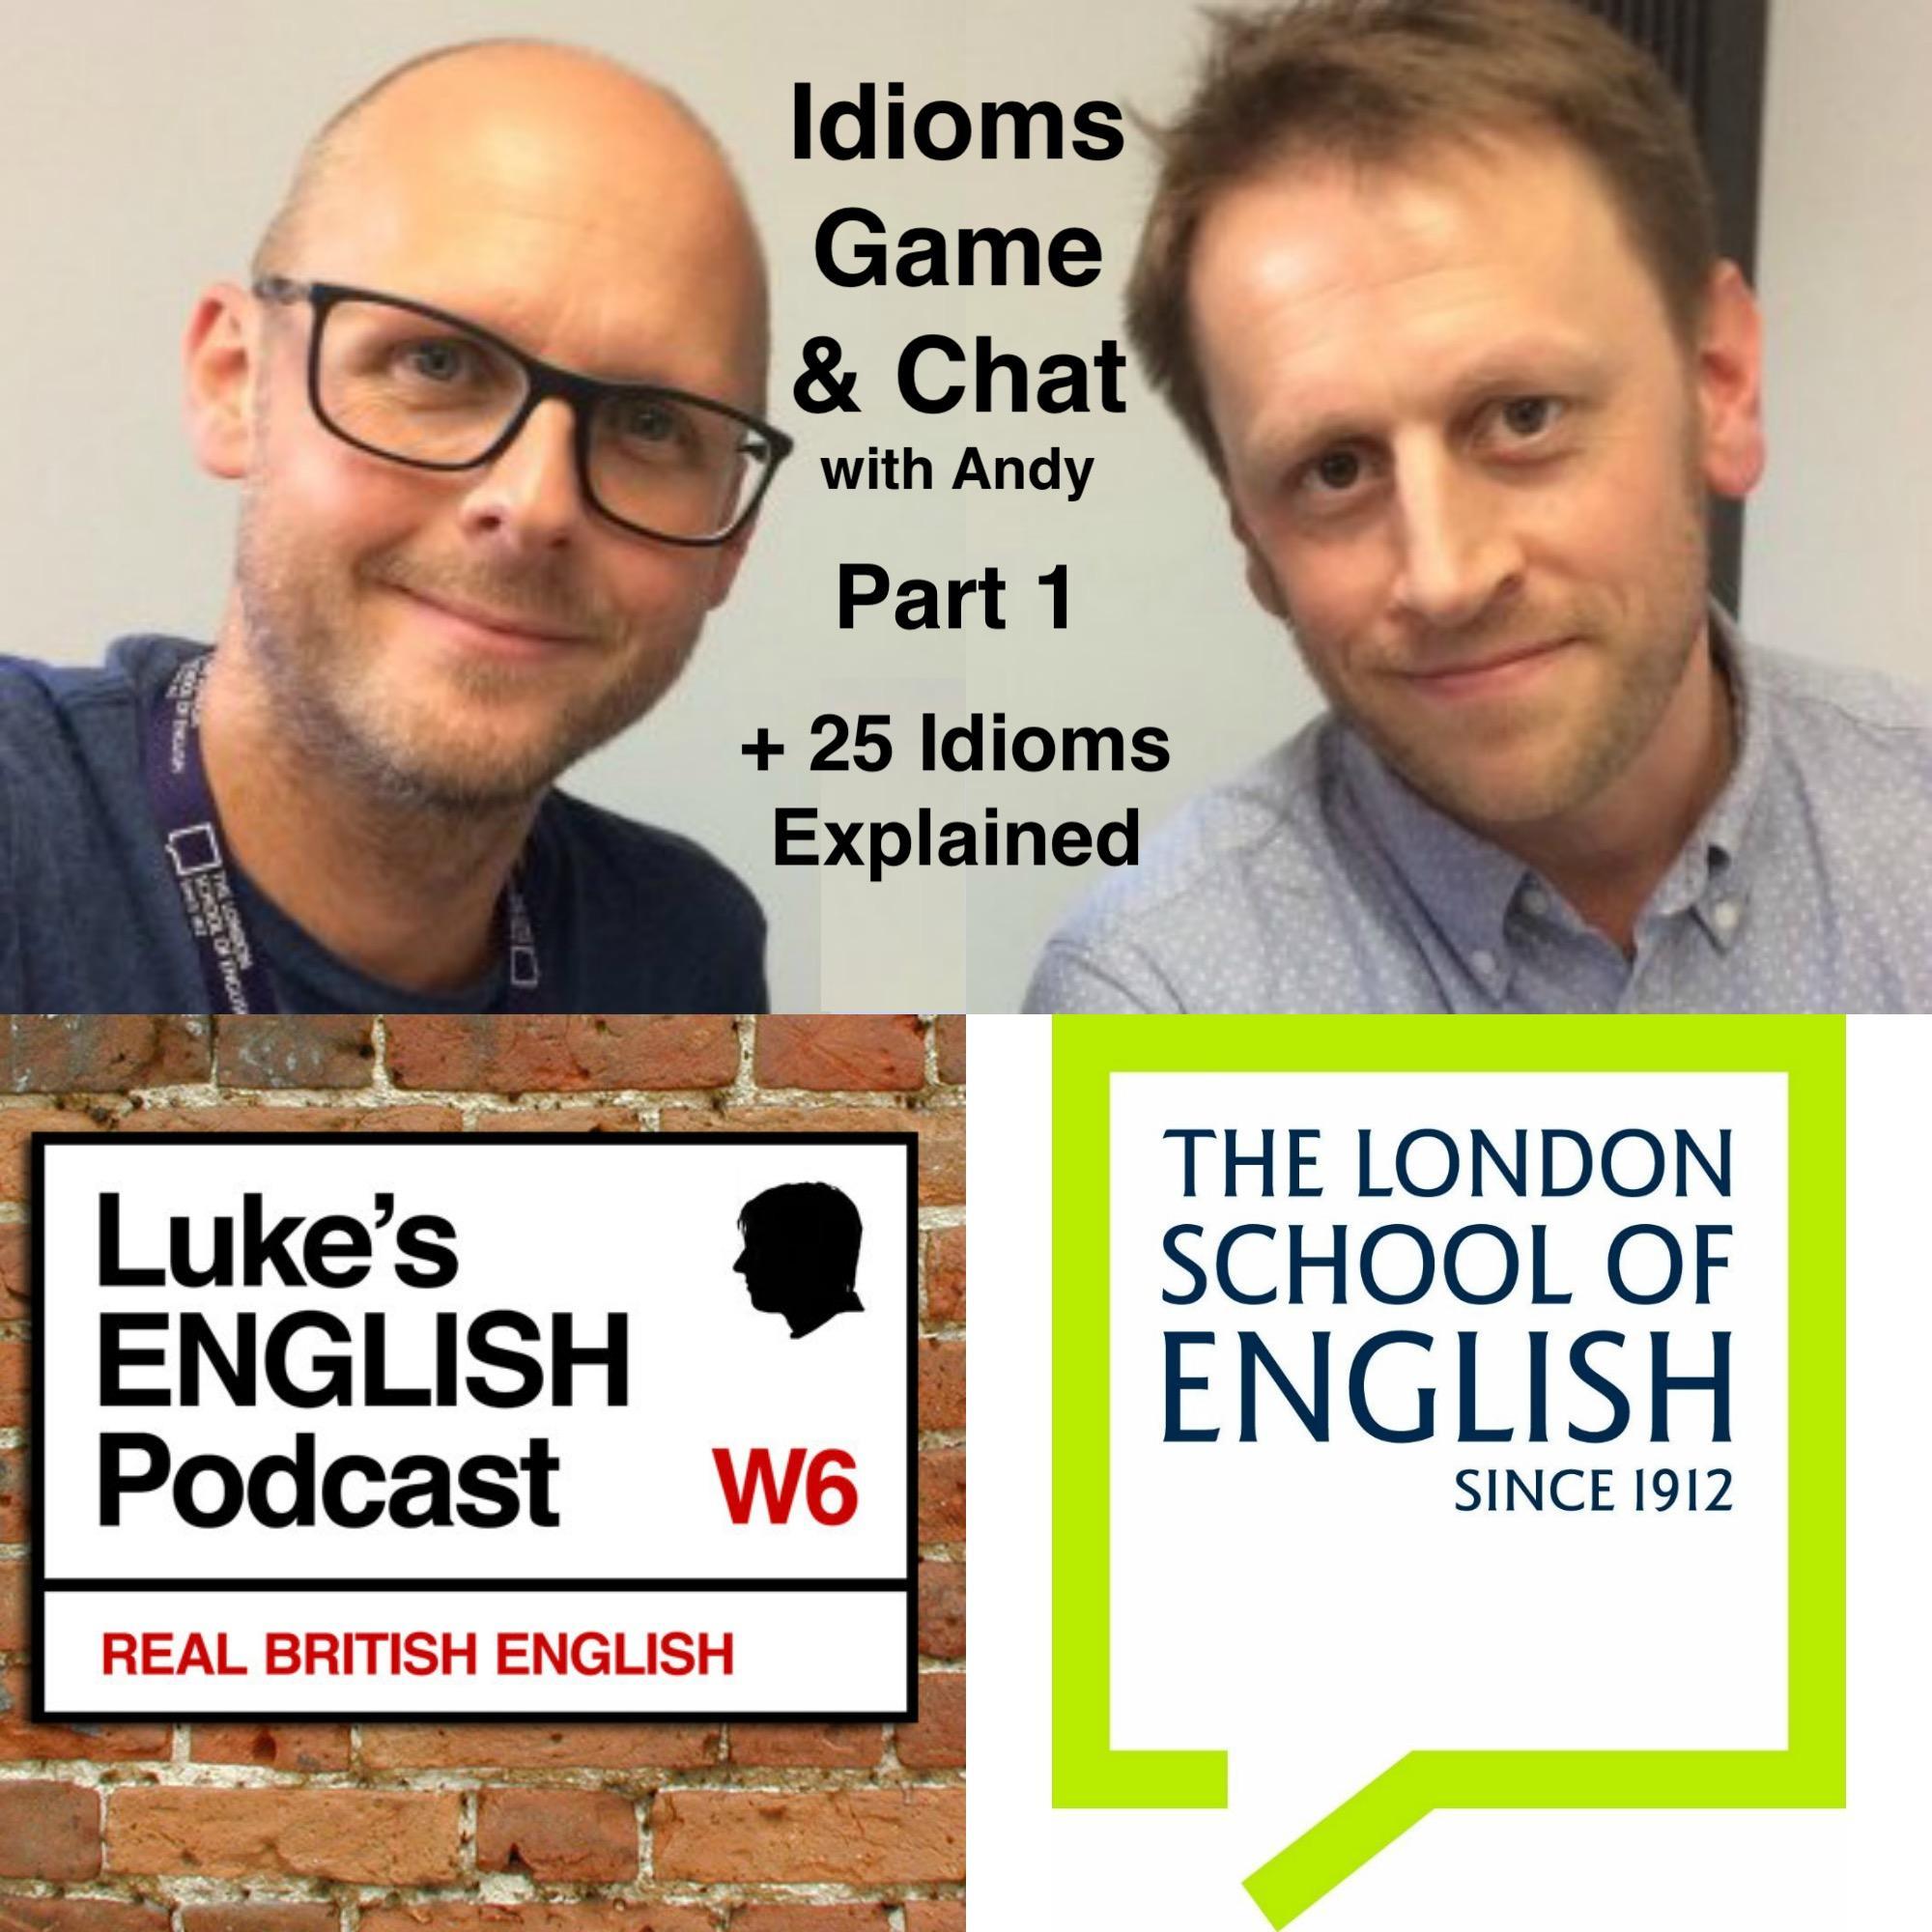 idioms | Luke's ENGLISH Podcast